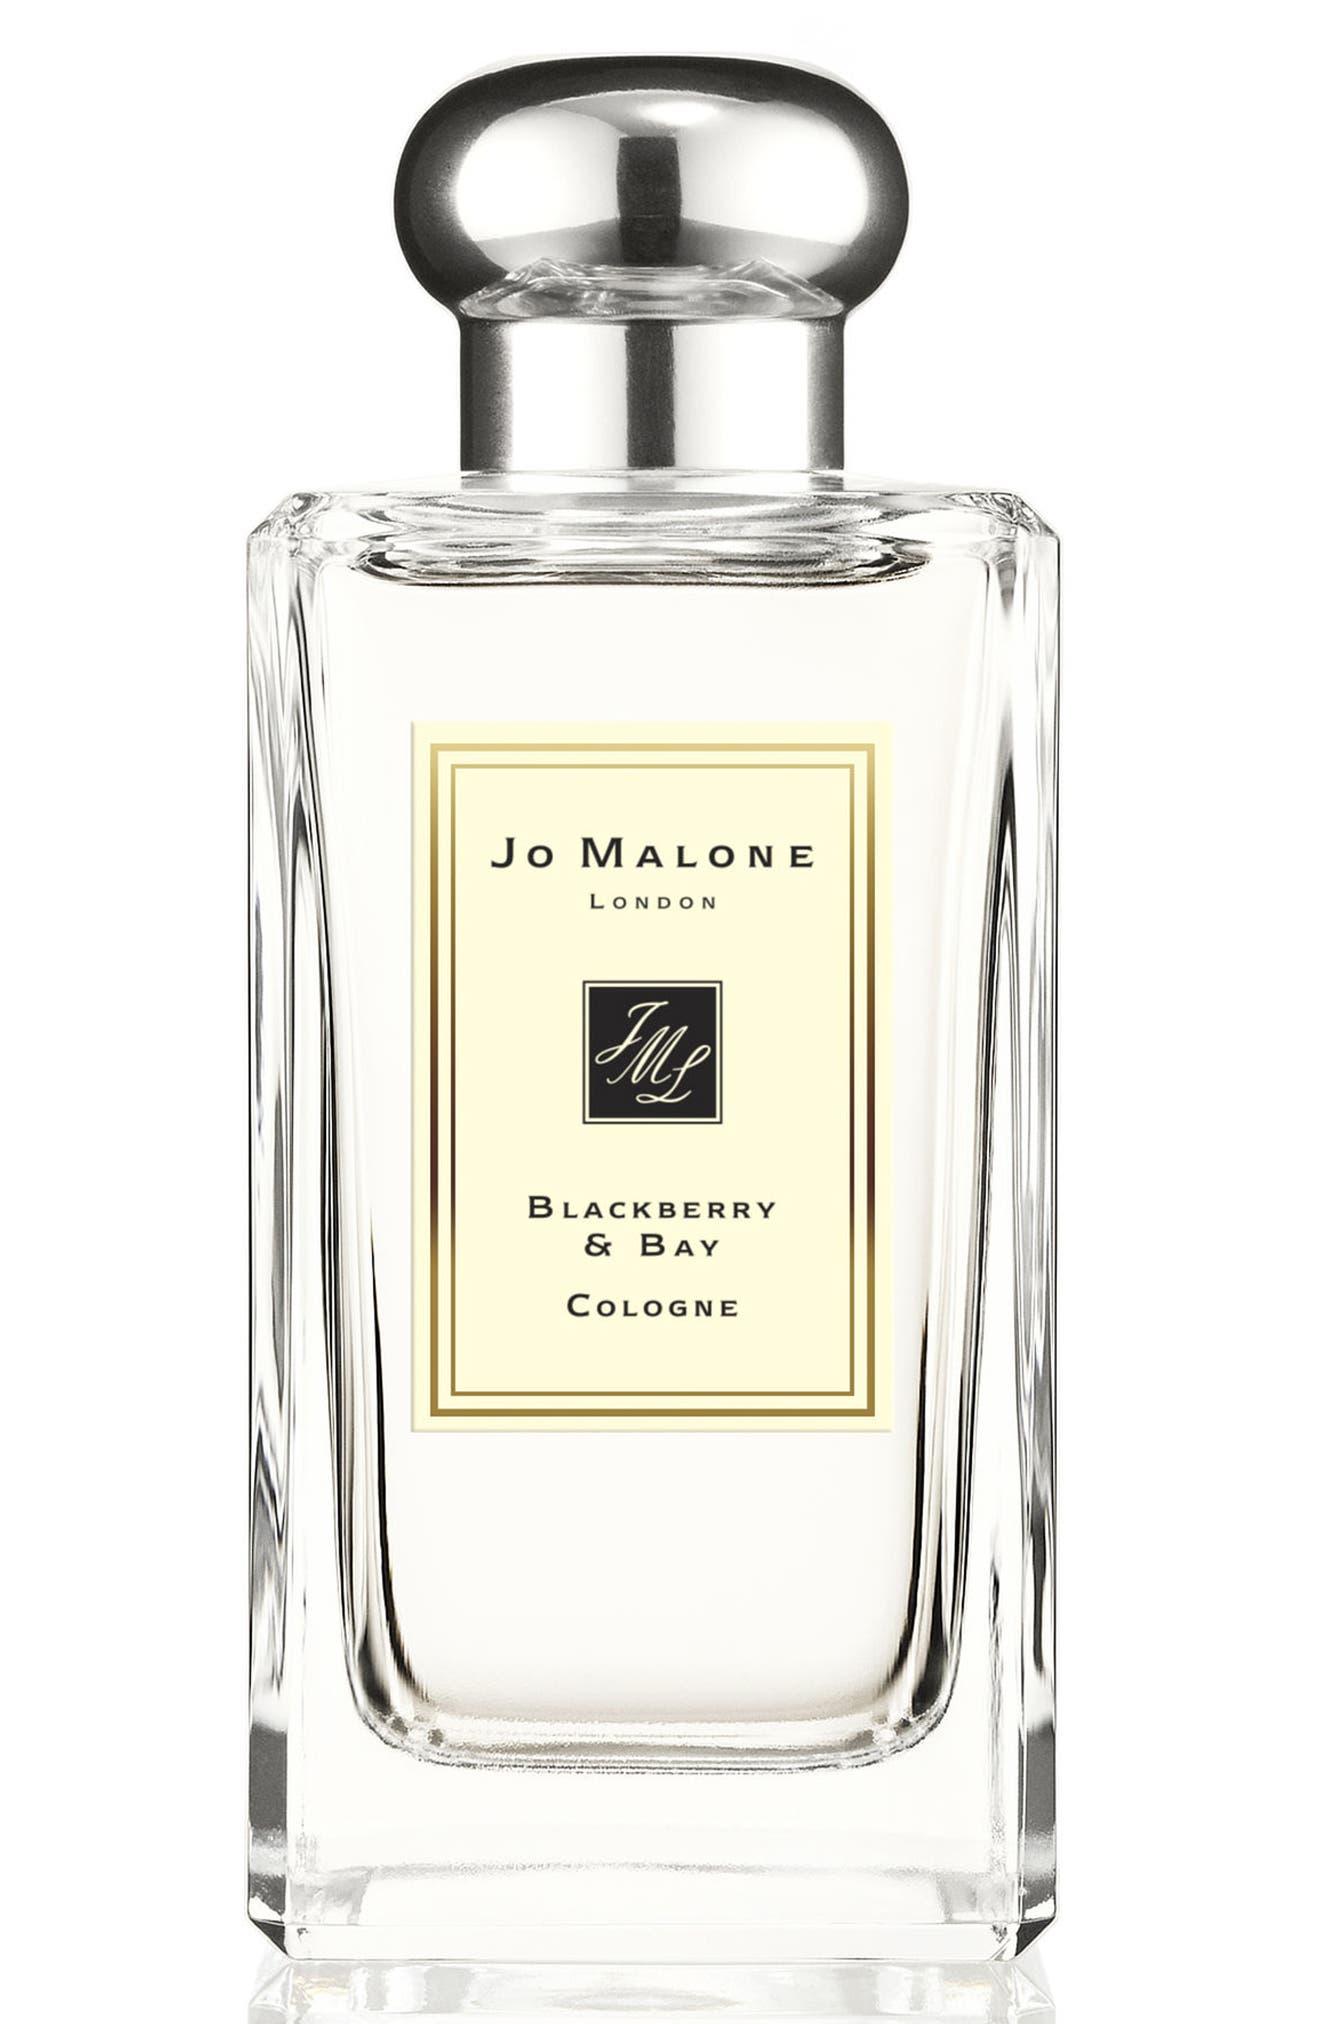 Jo Malone London™ Blackberry & Bay Cologne (3.4 oz.)